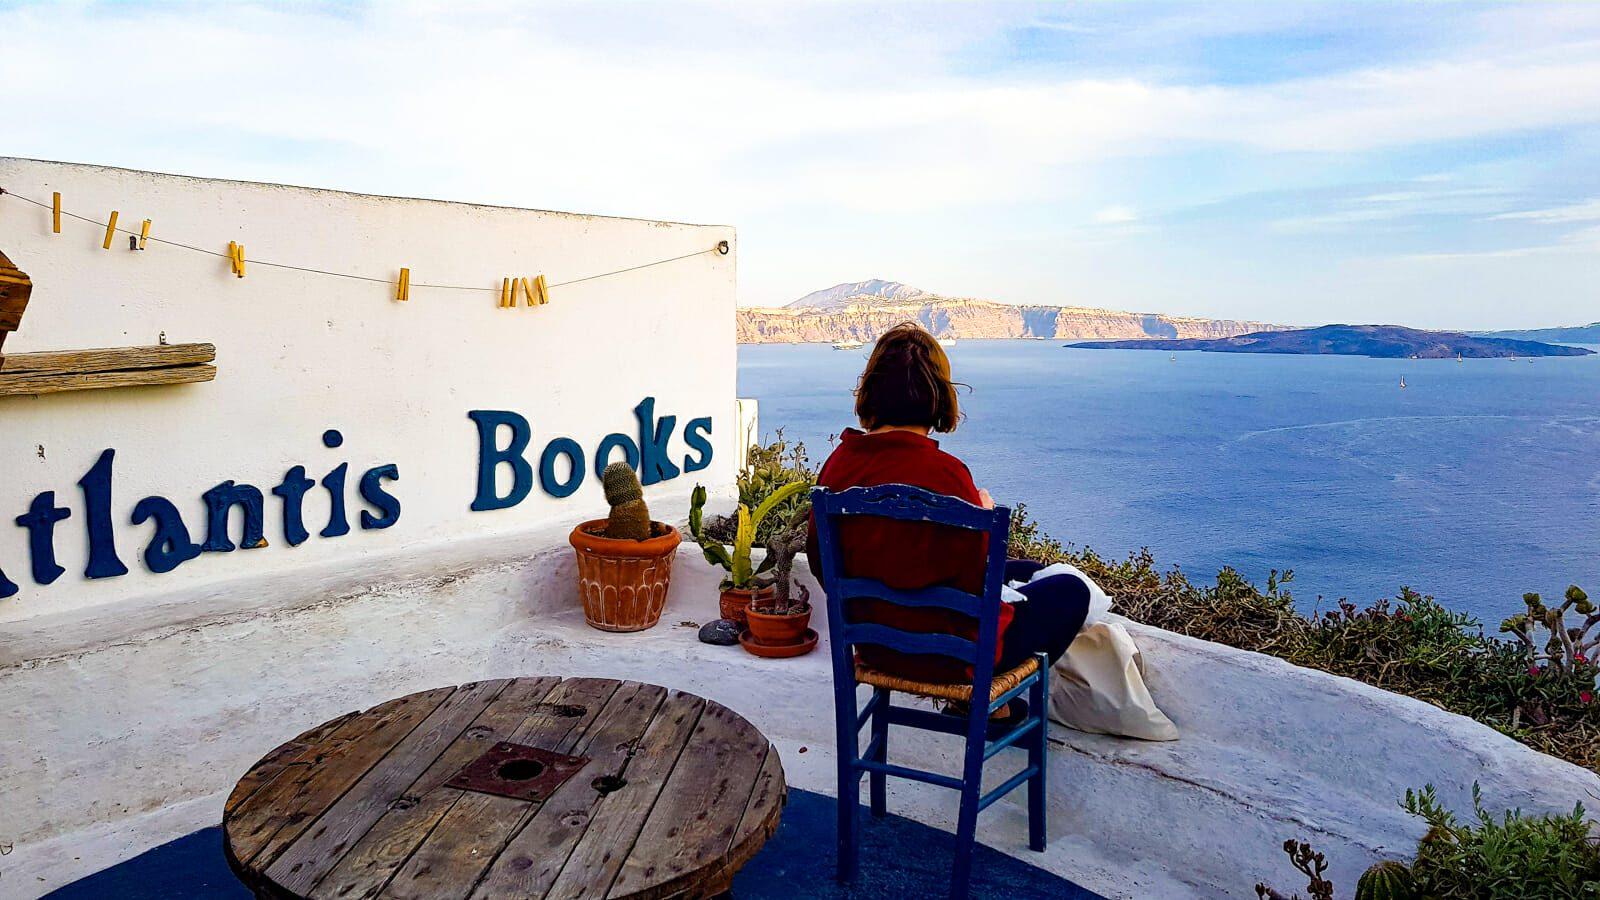 Atlantis Books Santorin